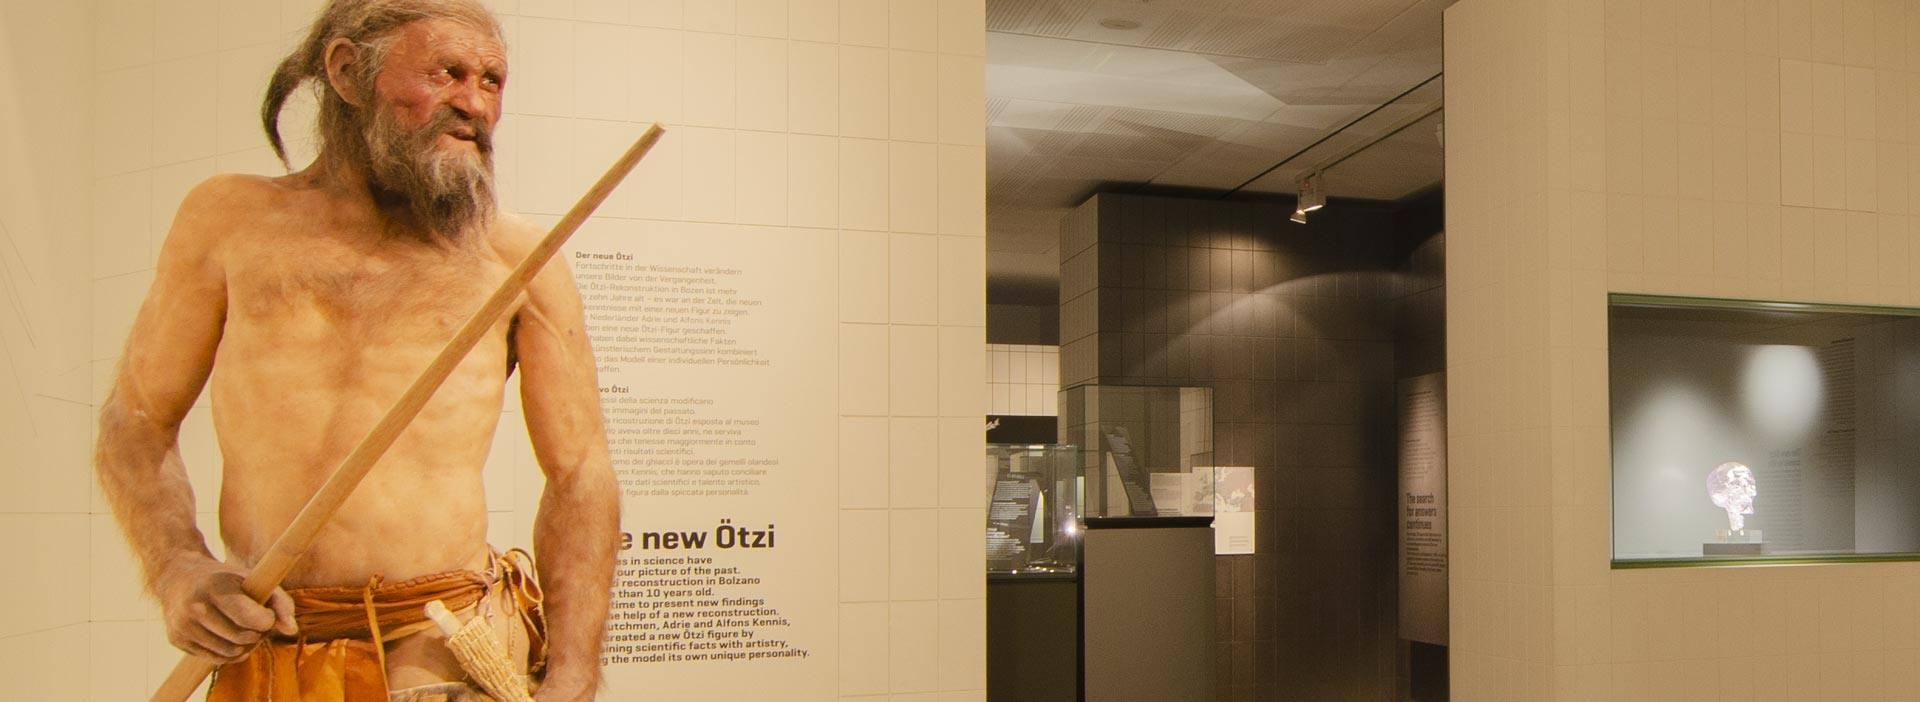 Südtiroler Archäologiemuseum